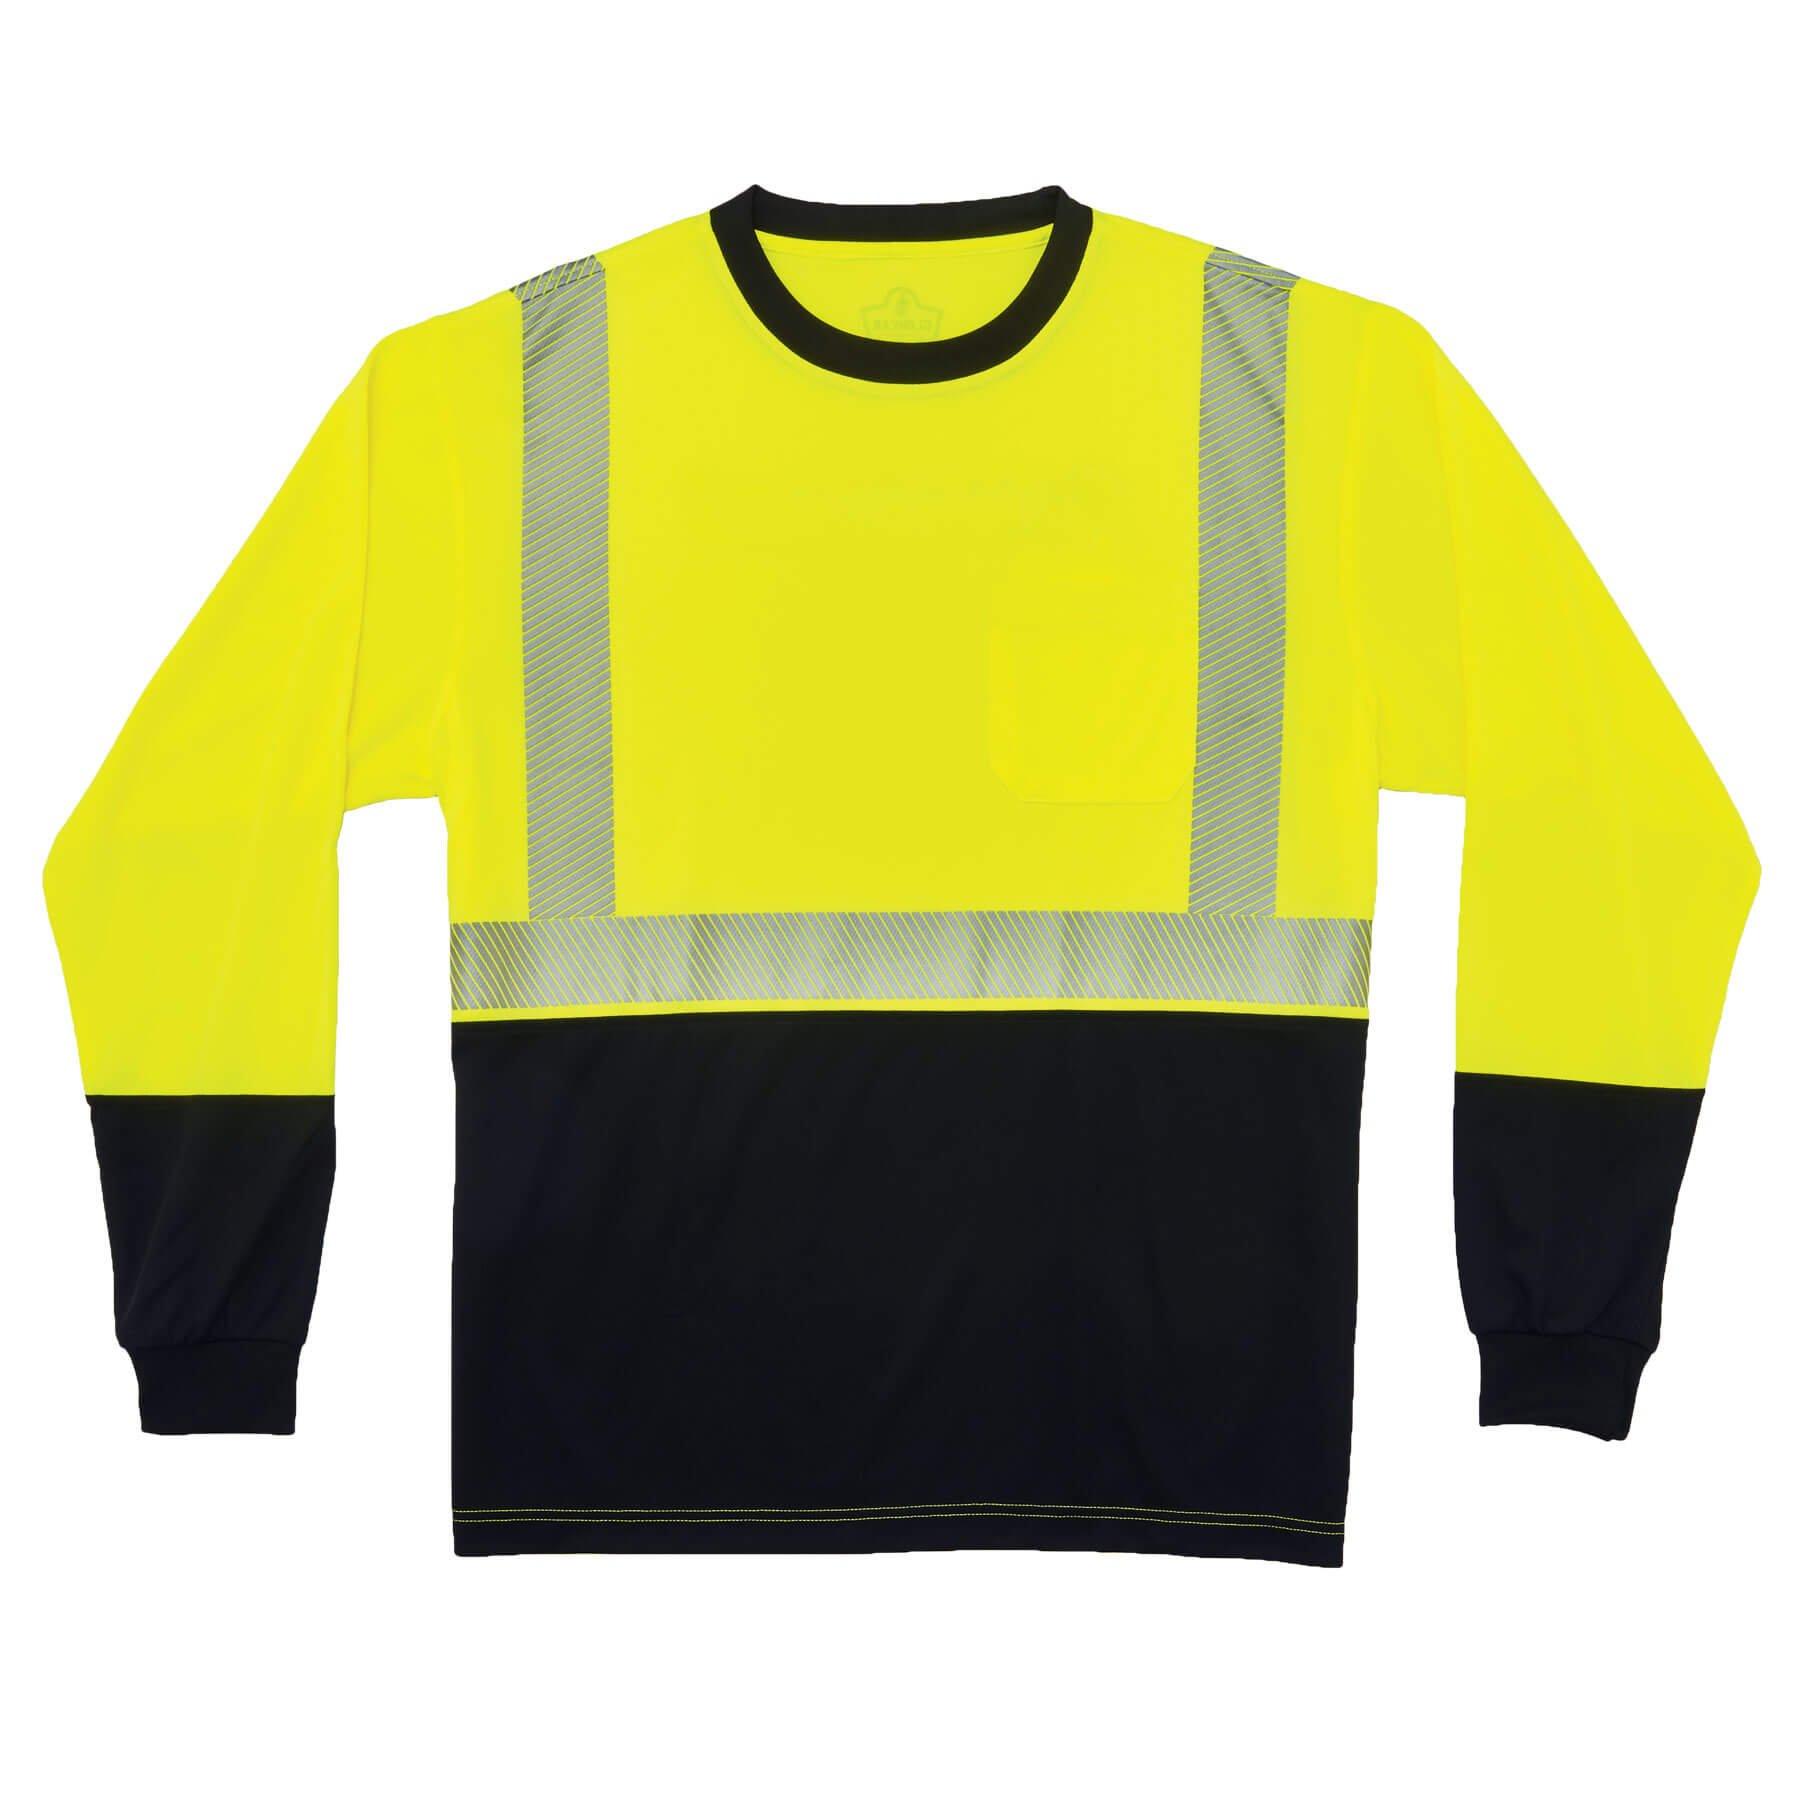 Ergodyne GloWear 8281BK ANSI Black Bottom High Visibility Long Sleeve Reflective Safety Shirt, Lime, Medium